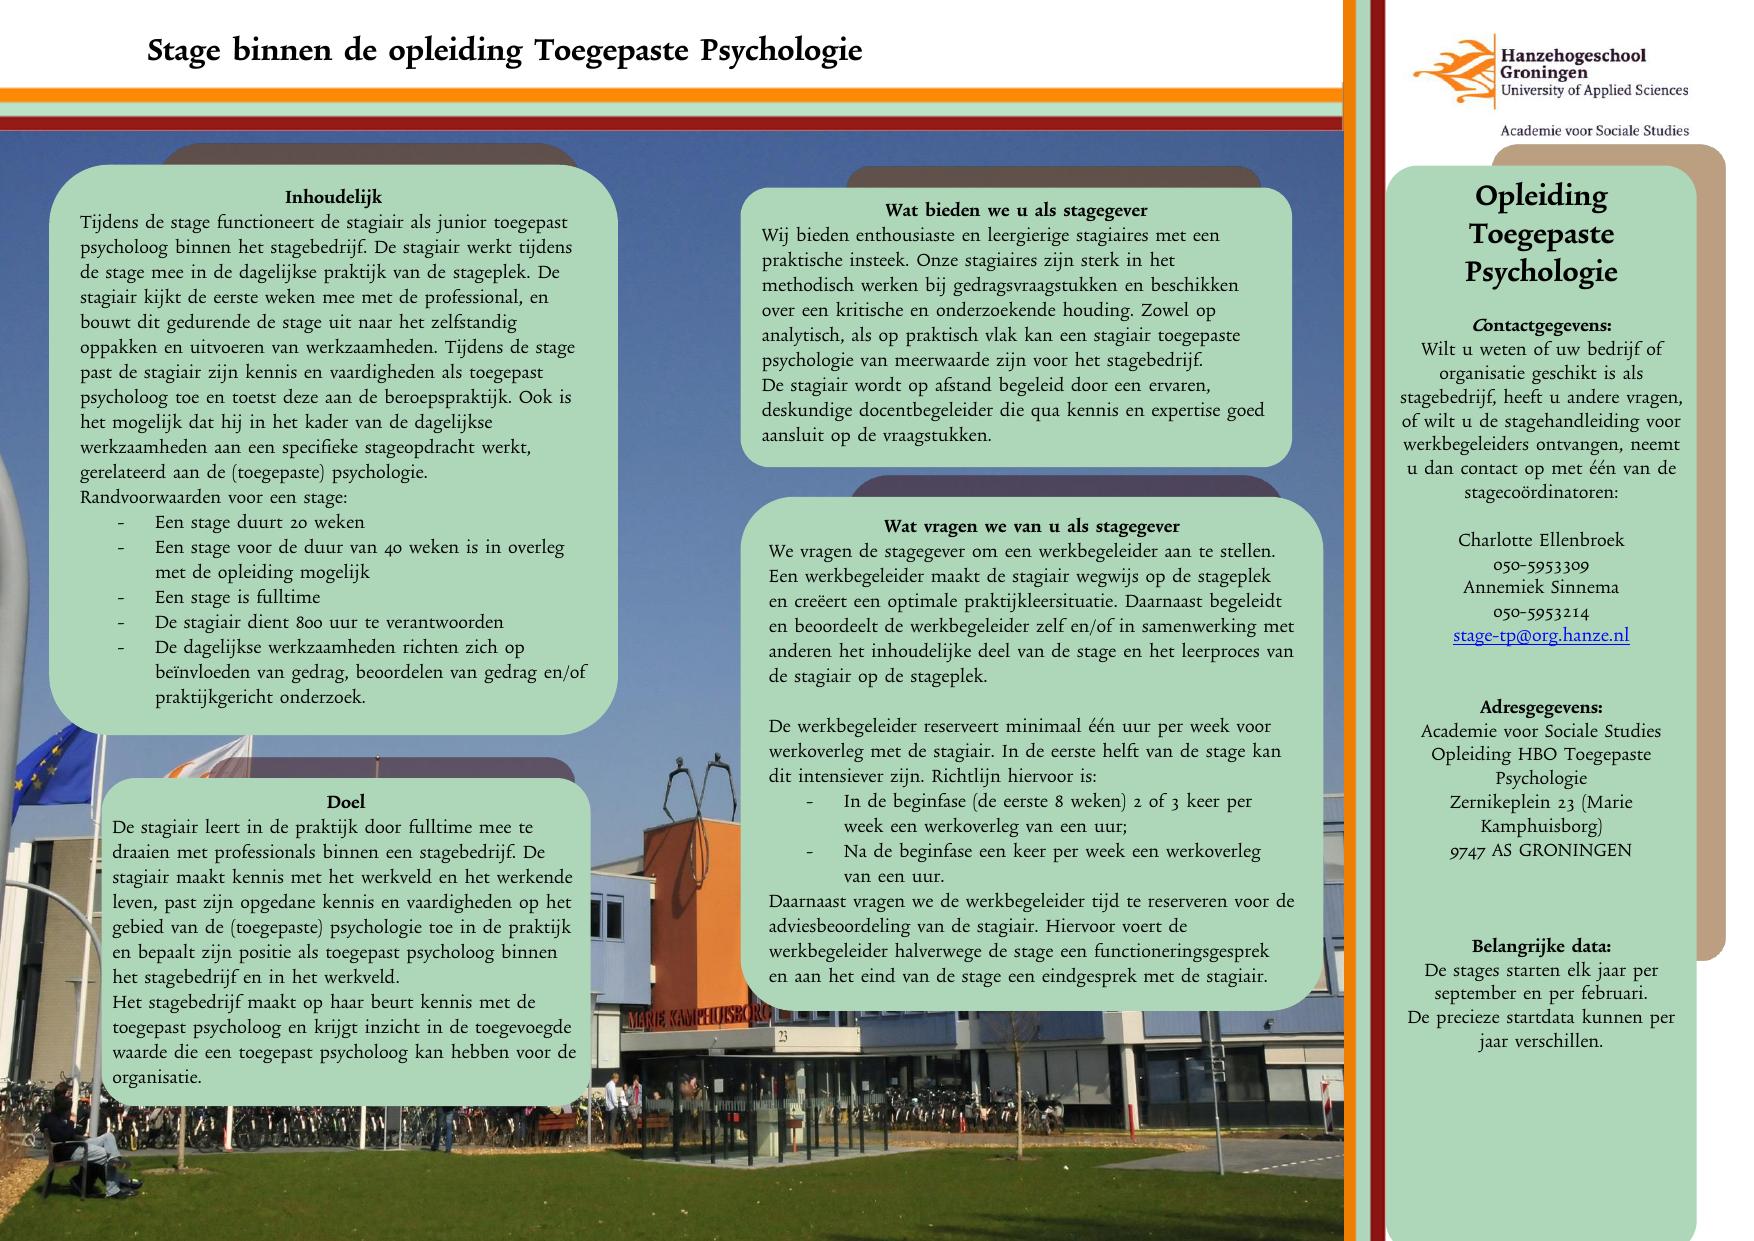 stage toegepaste psychologie